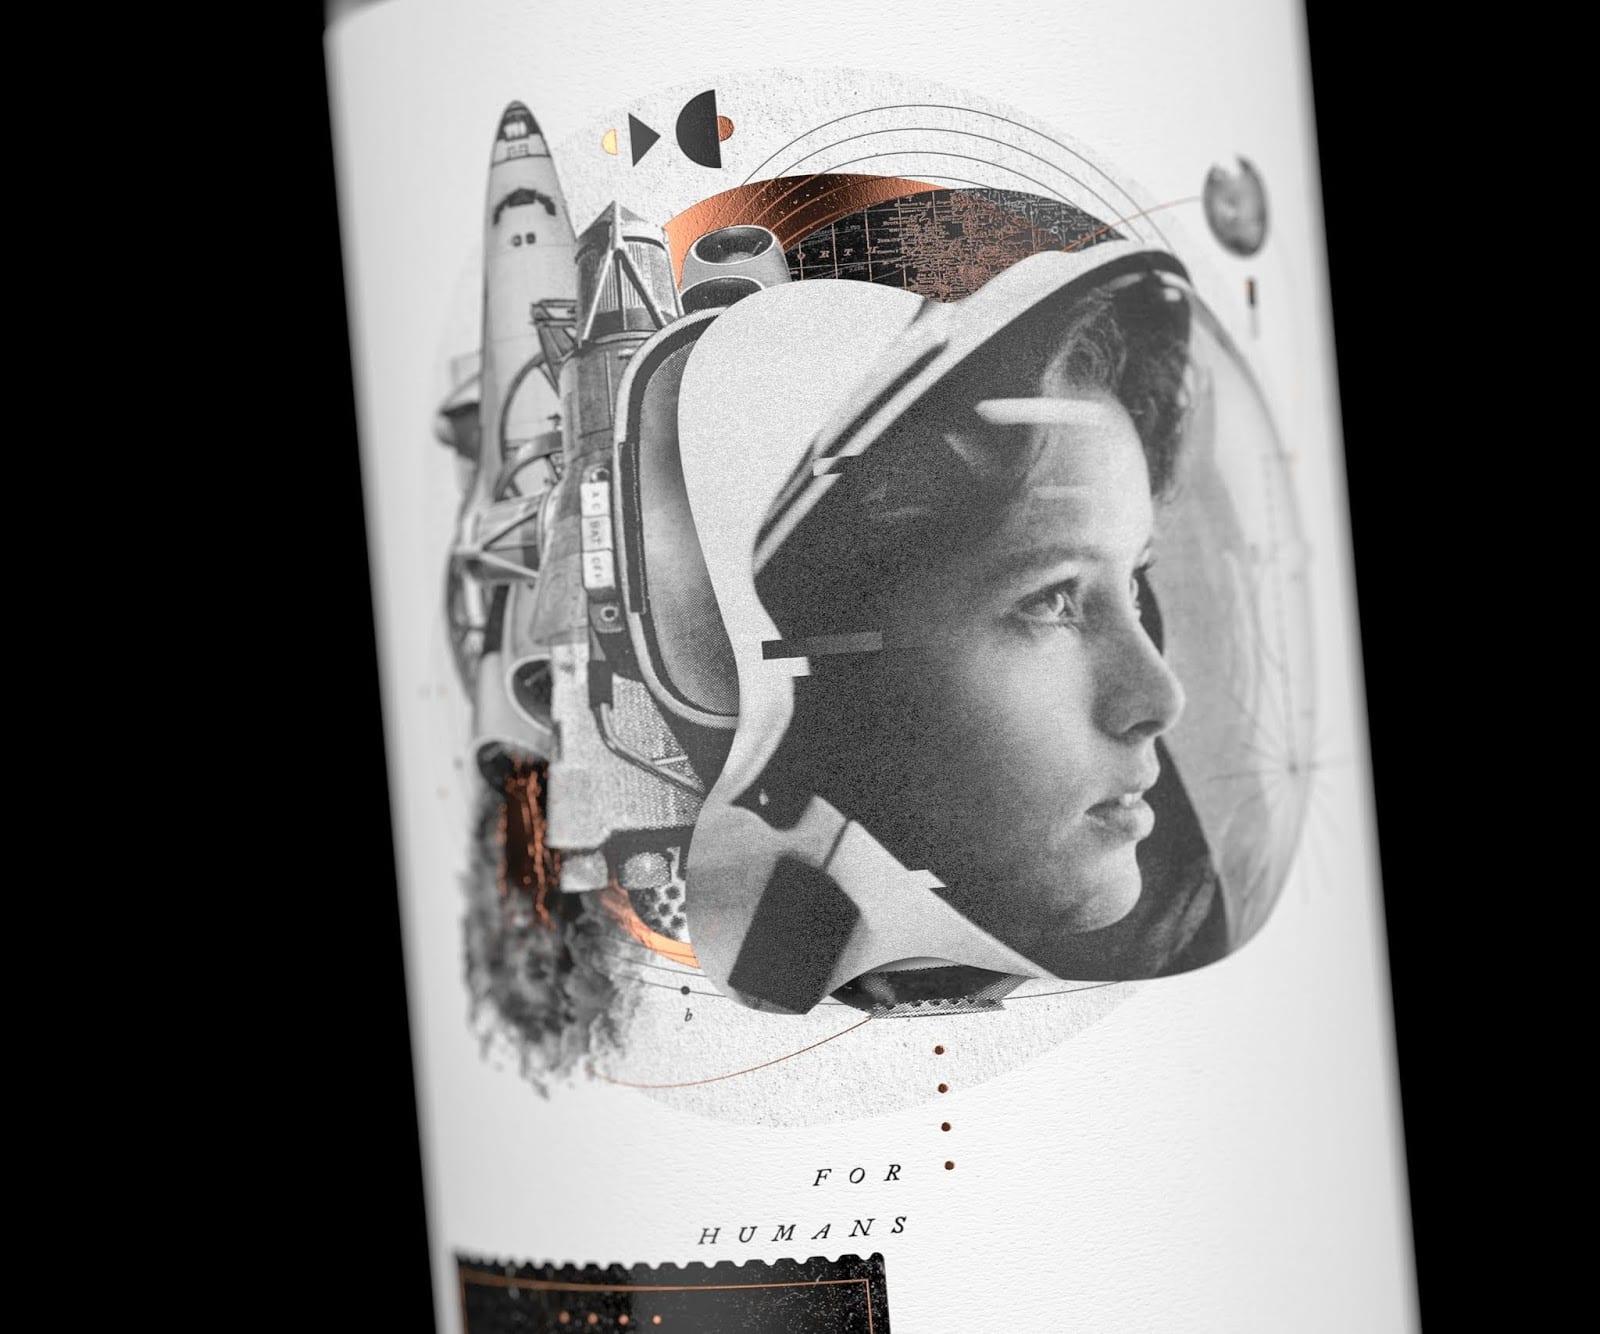 Human Legacy Bottles 6 - Ach, tie obaly – Lahve Human Legacy